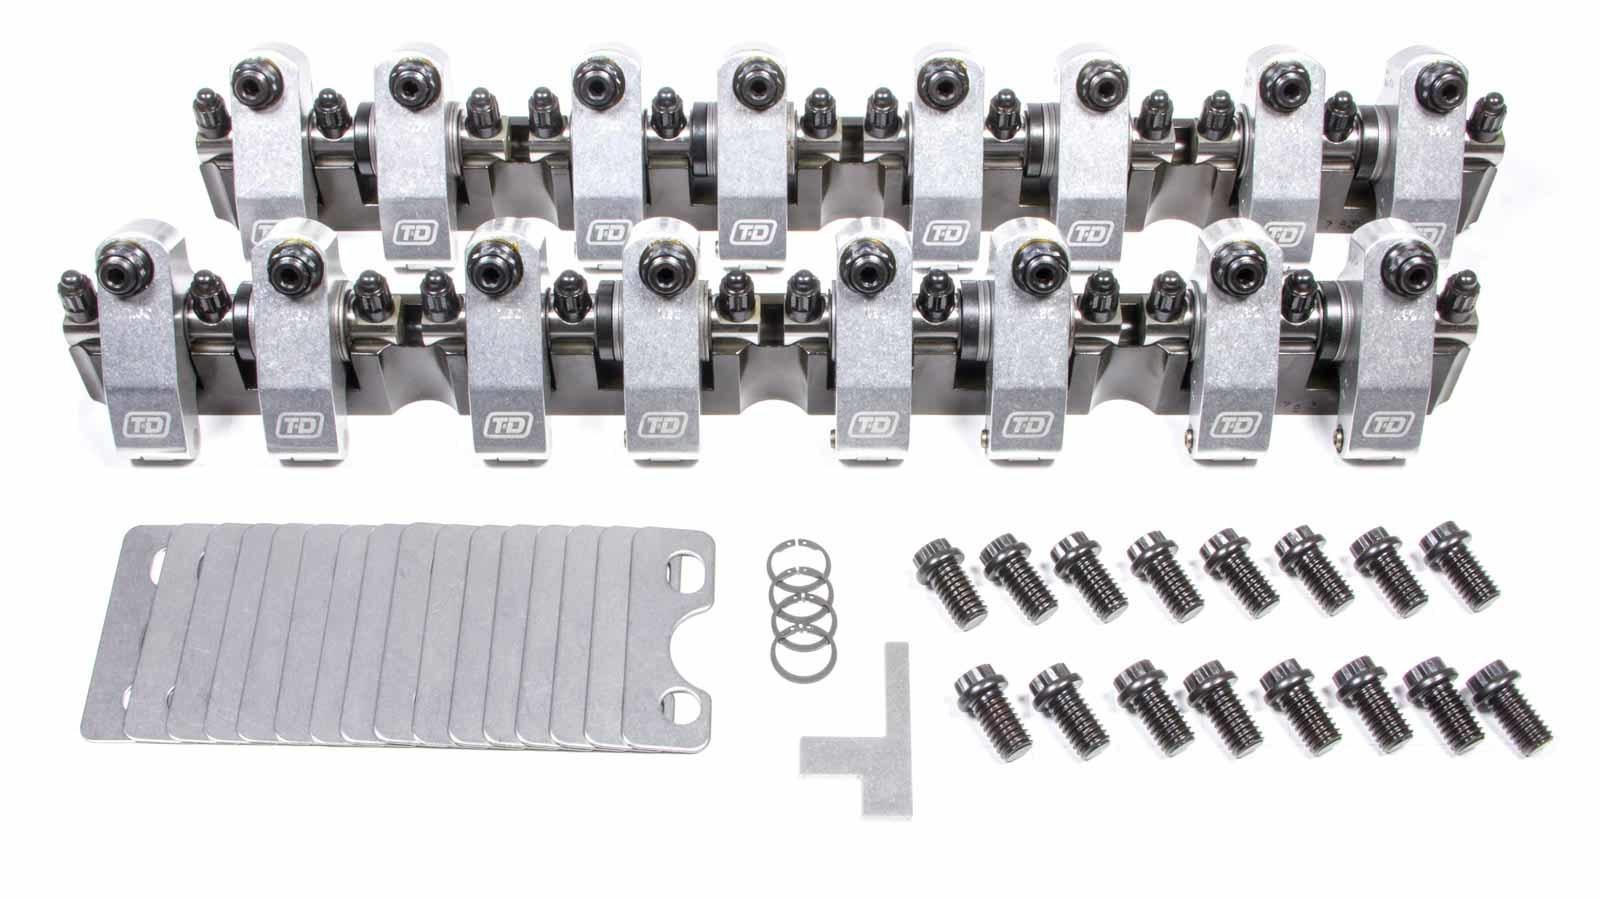 T&D Machine 7341-160/160 Rocker Arm, Shaft Mount, 1.60 Ratio, Full Roller, Aluminum, Natural, AFR 205 / 220 Big Valve, Small Block Ford, Kit